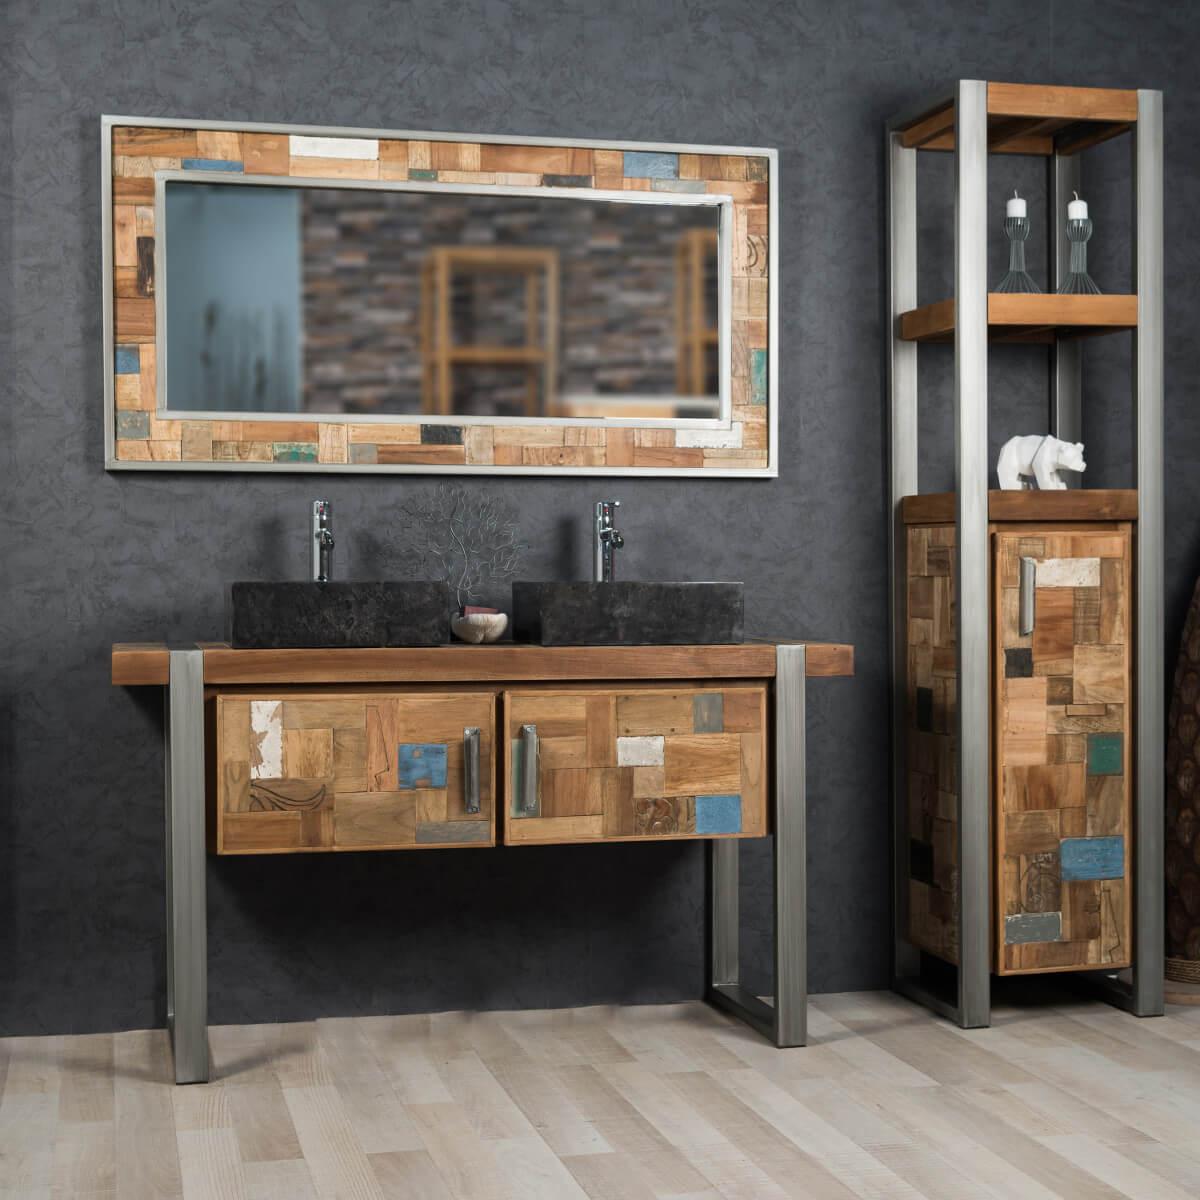 Meuble salle de bain style industriel